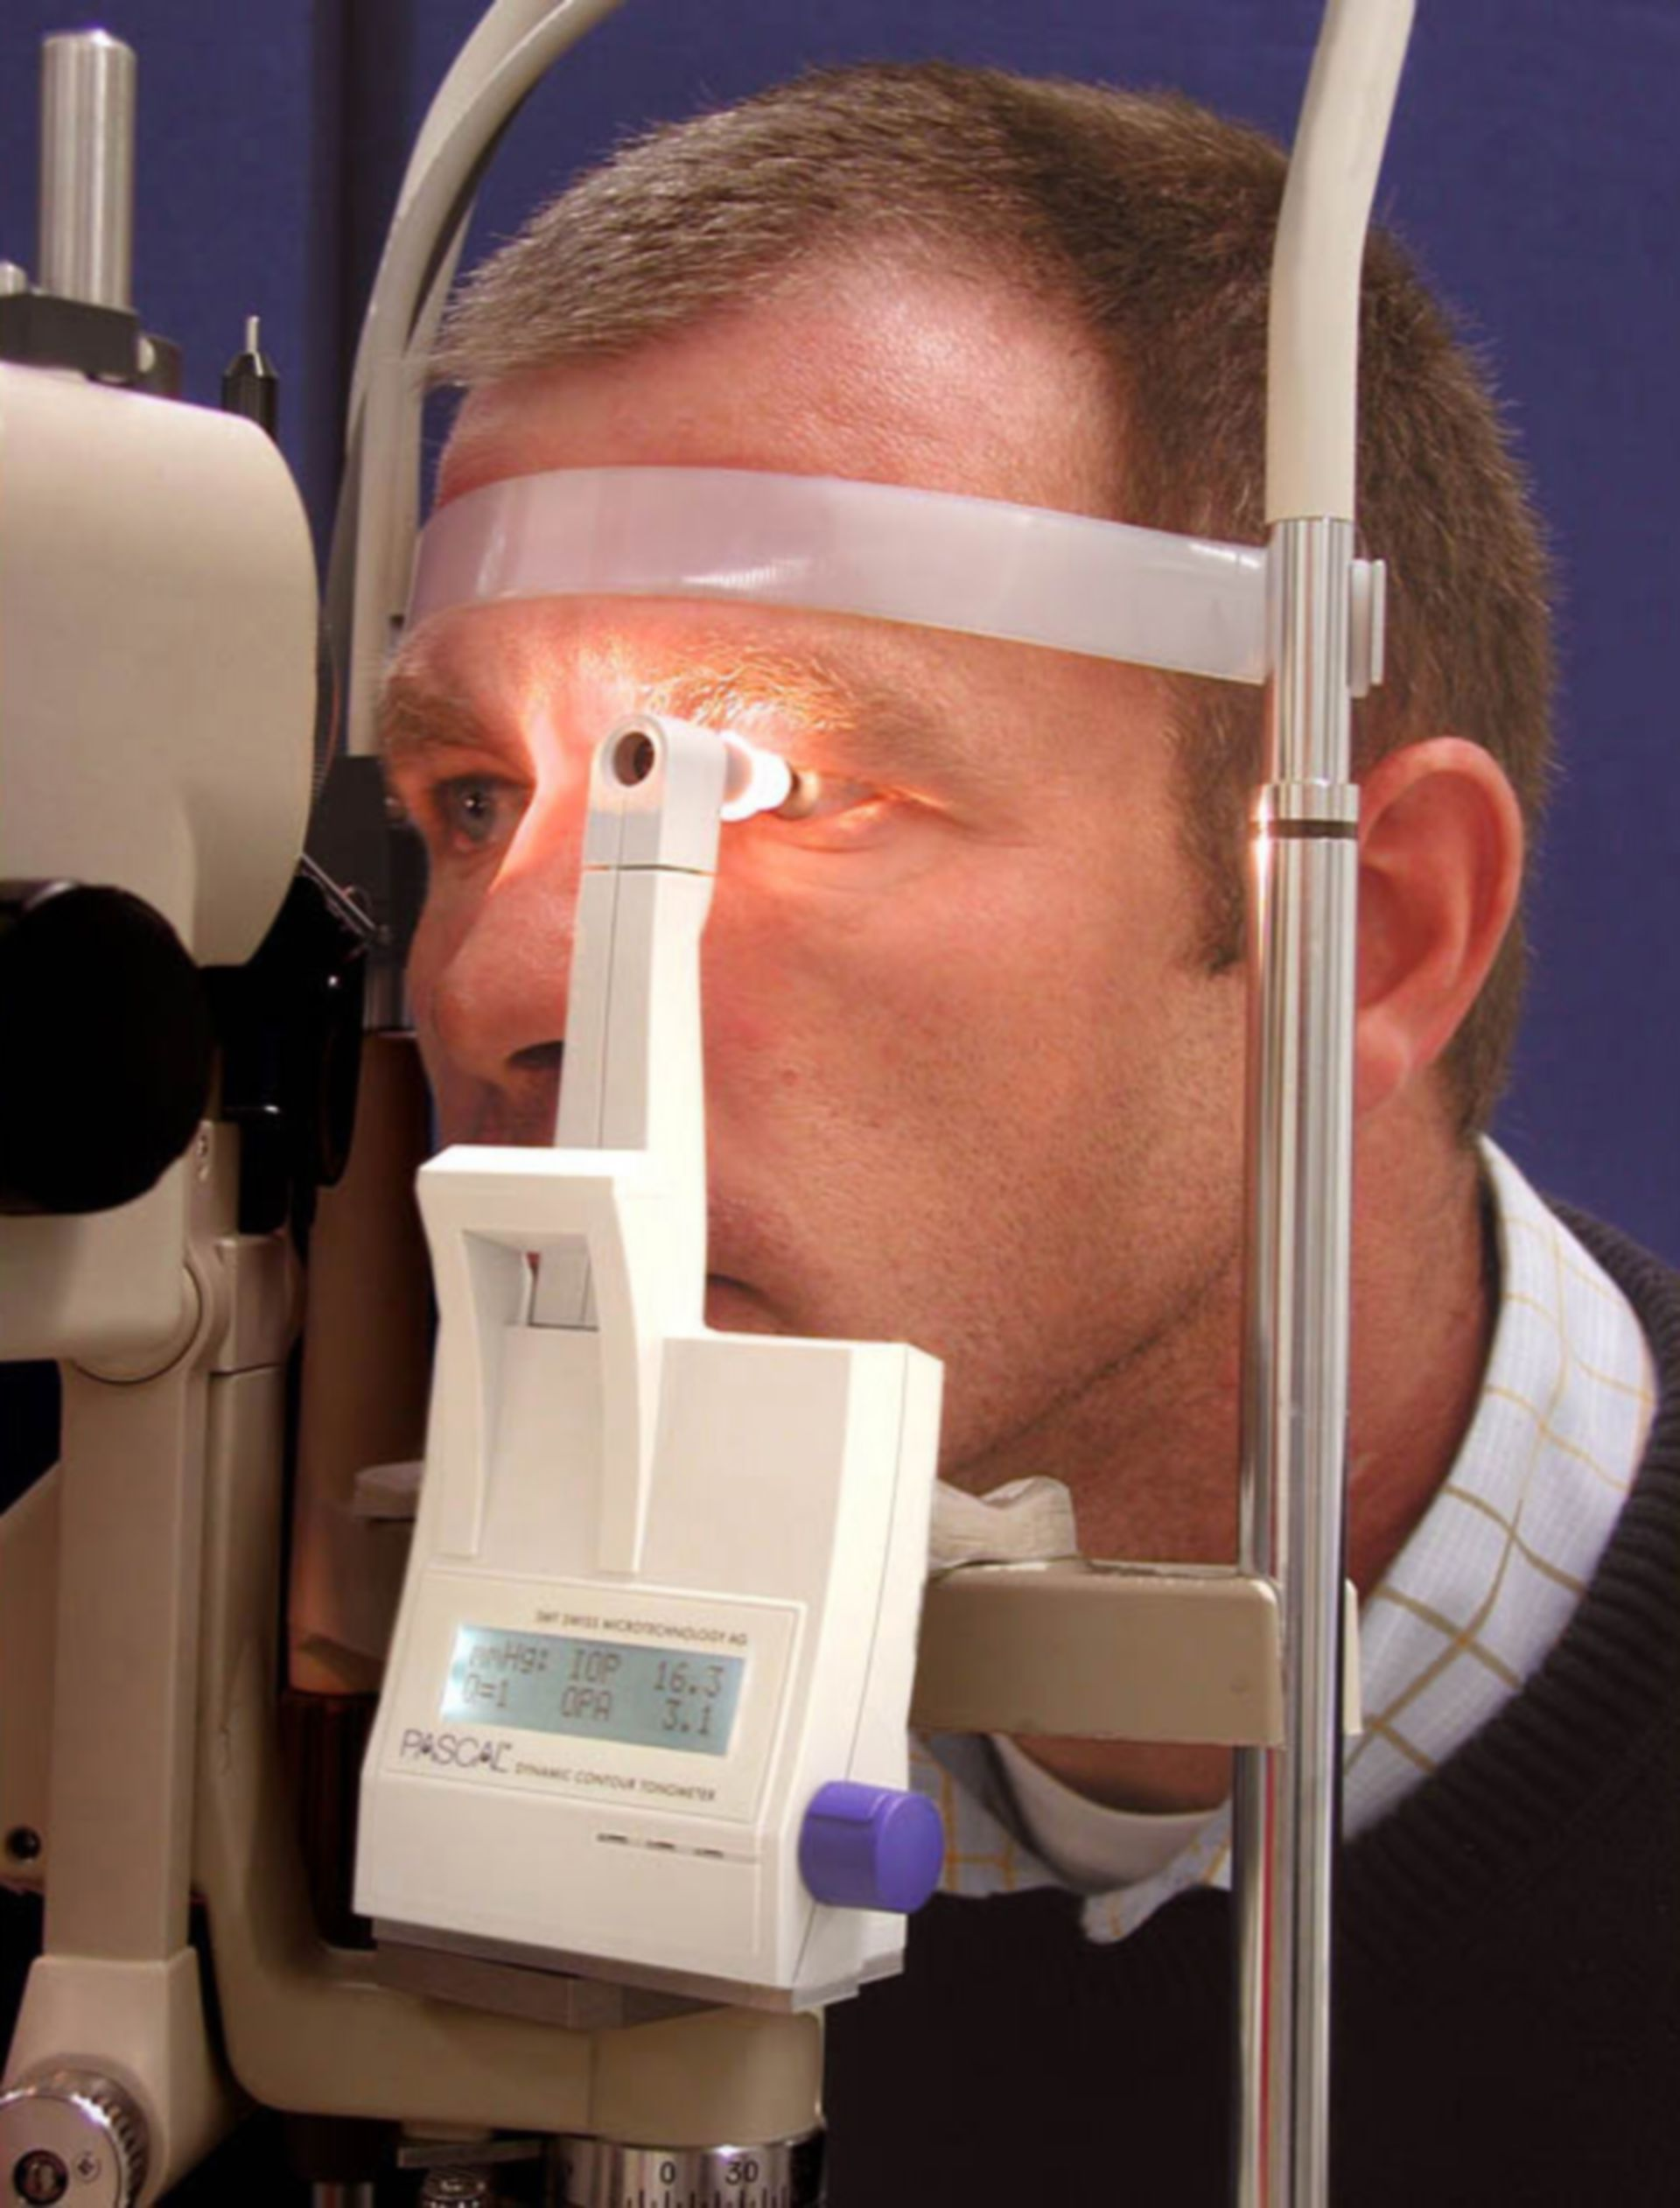 Augendruckmessung - Tonometer